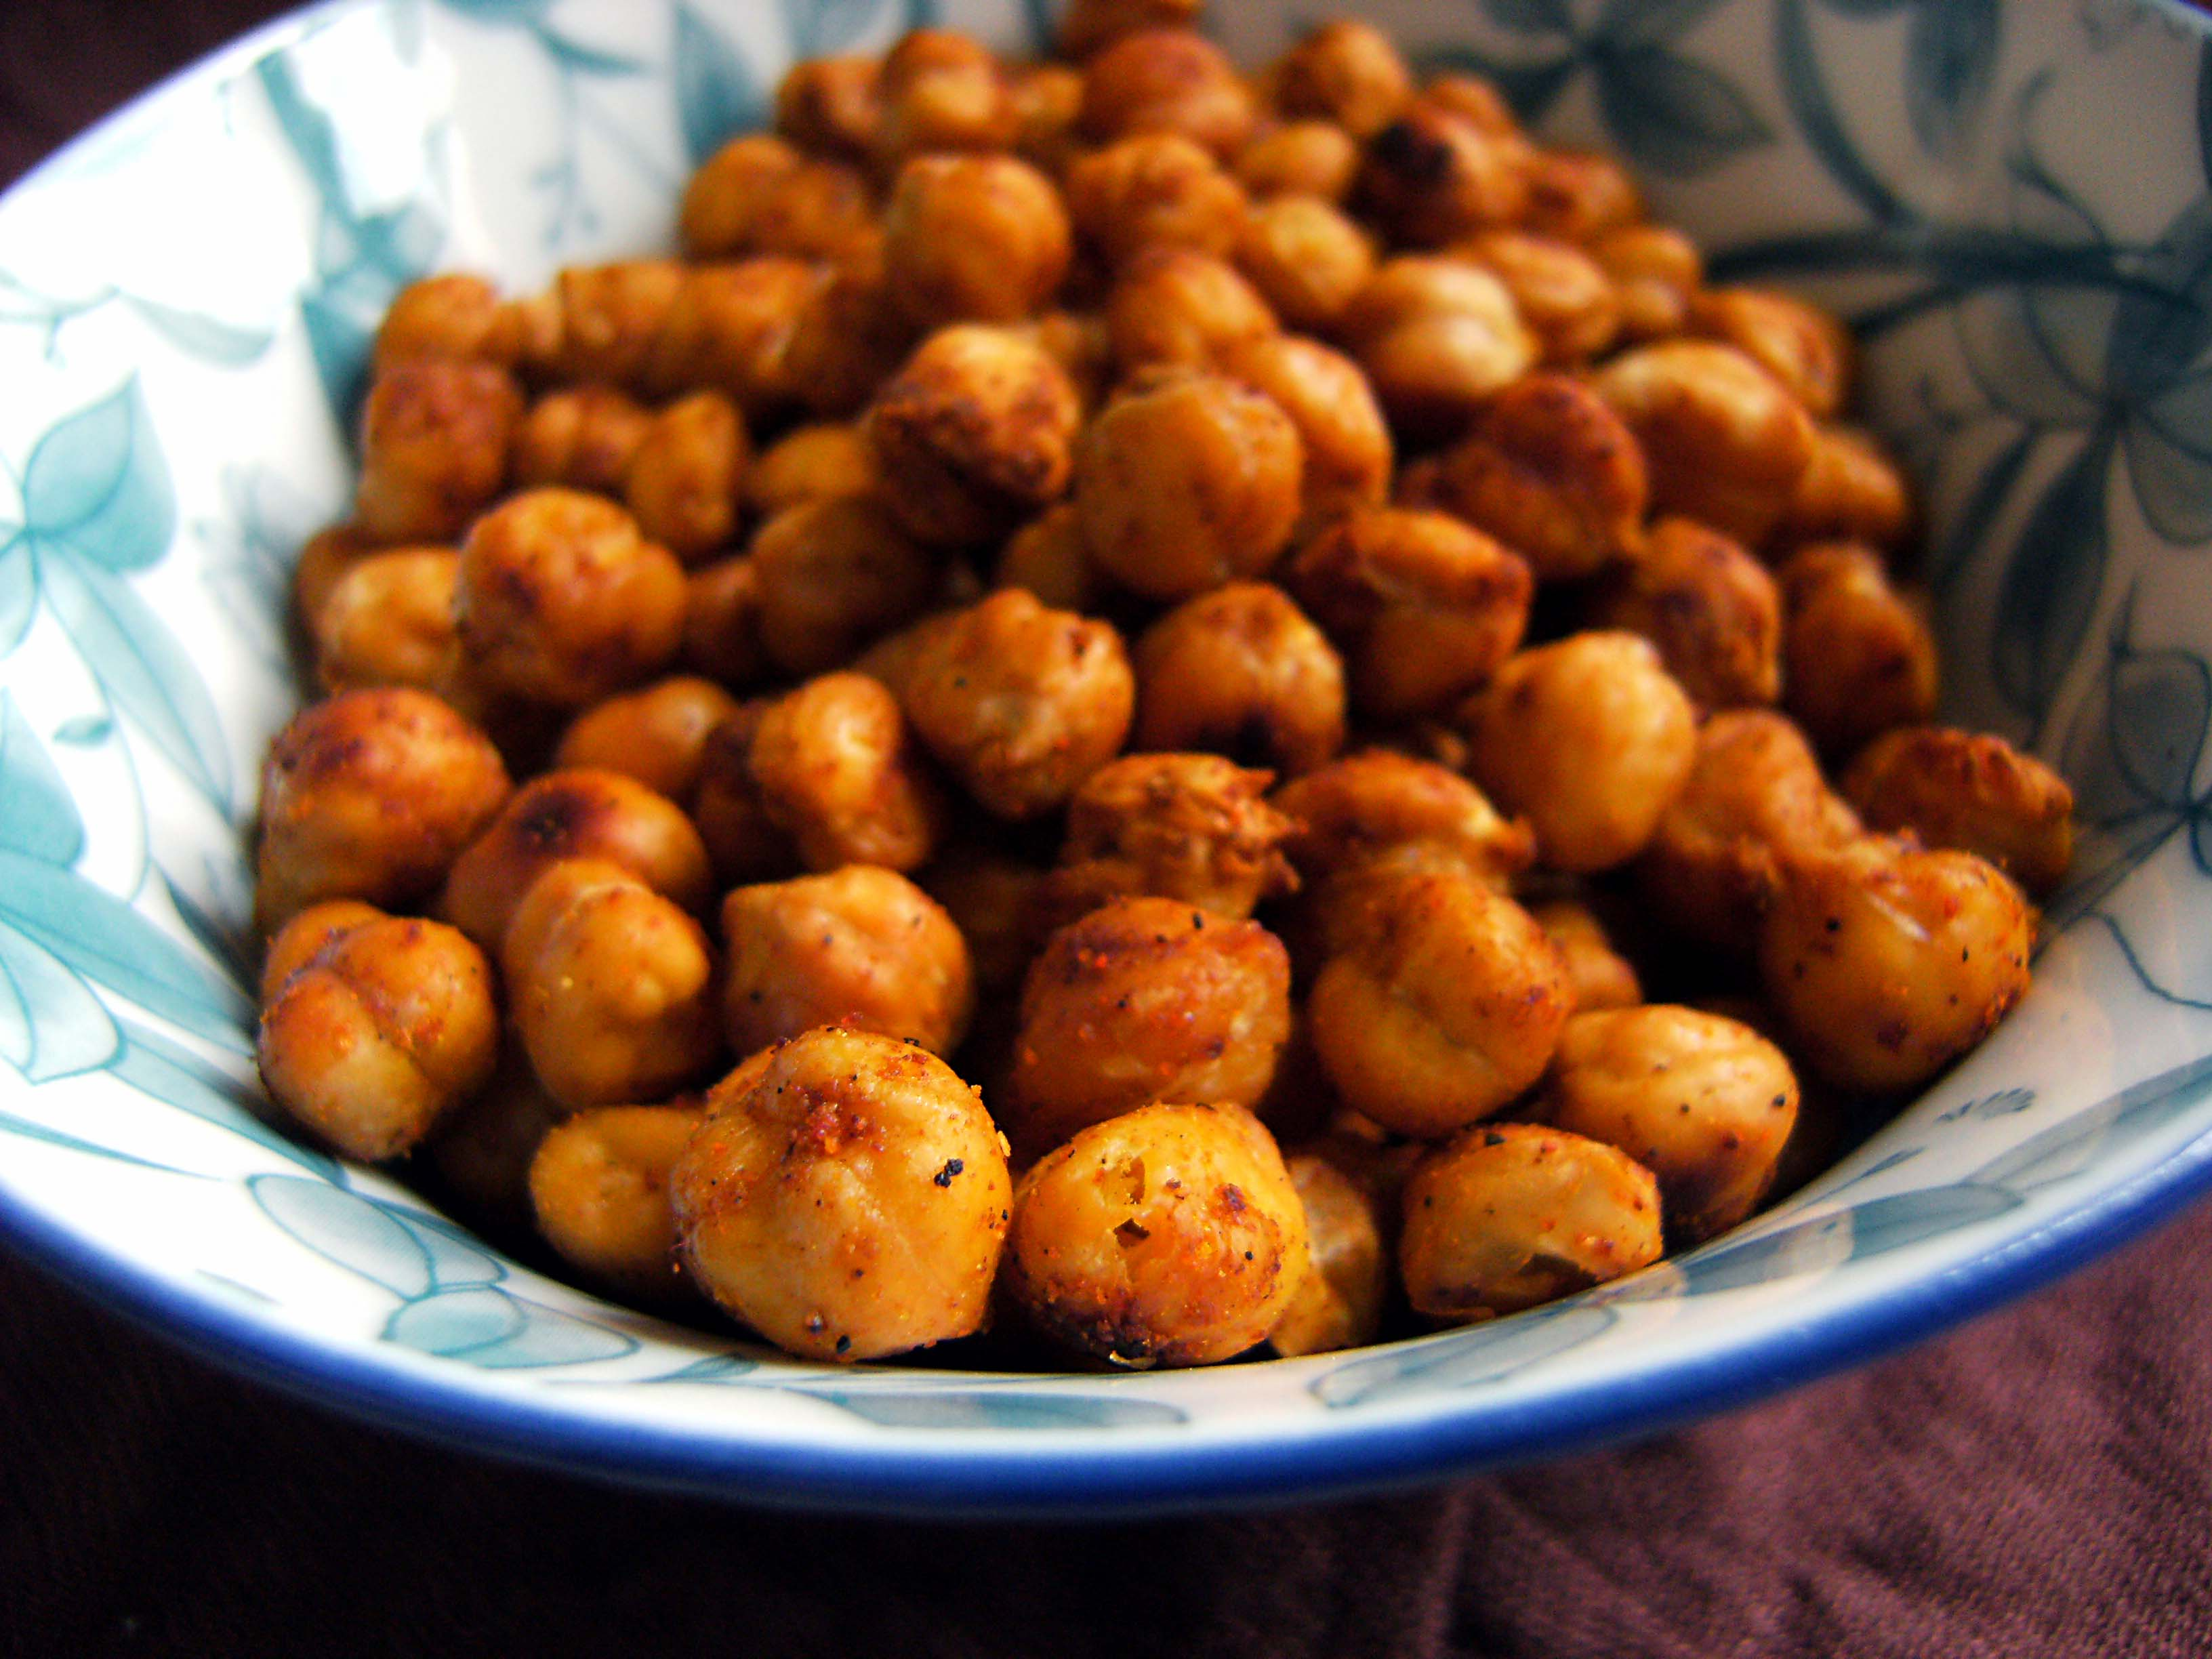 Roasted Garbanzo Beans/Chickpeas Recipe